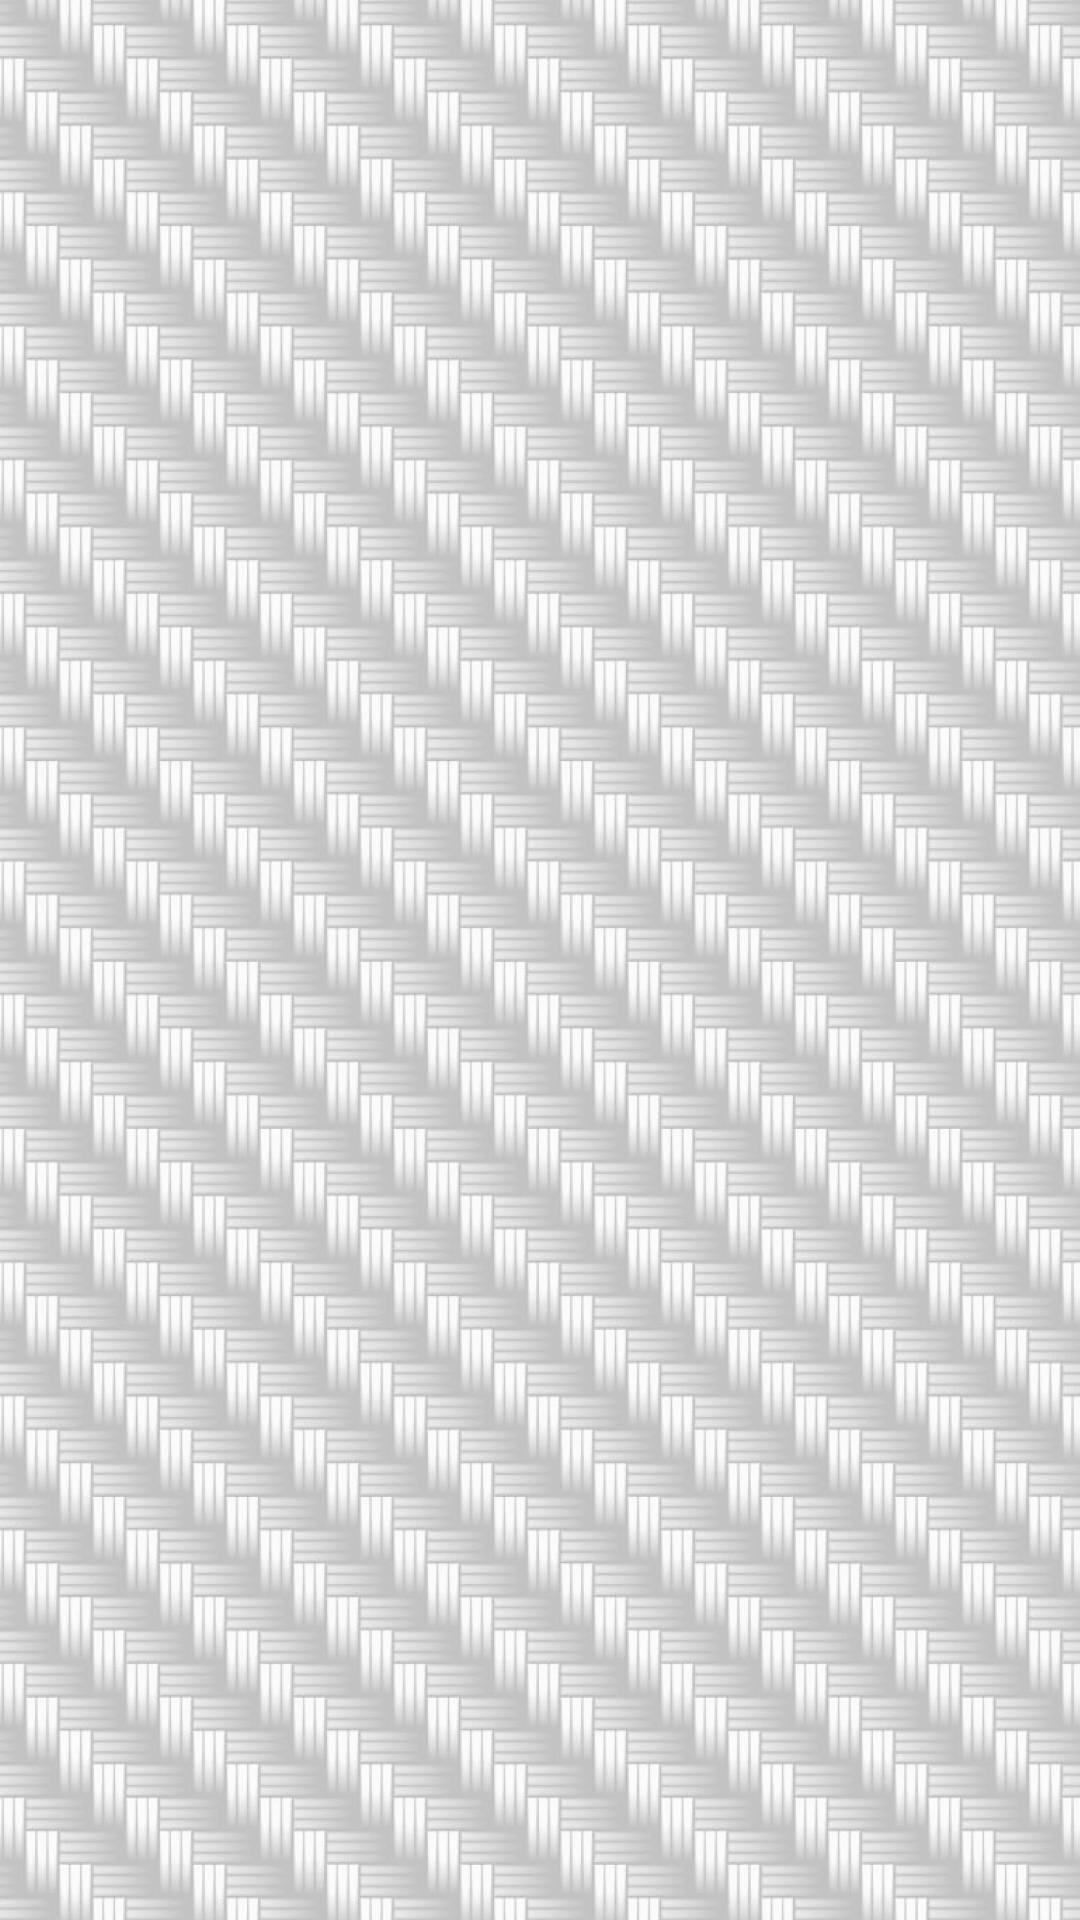 Iphone 6 Carbon Fiber Wallpaper 76 Images